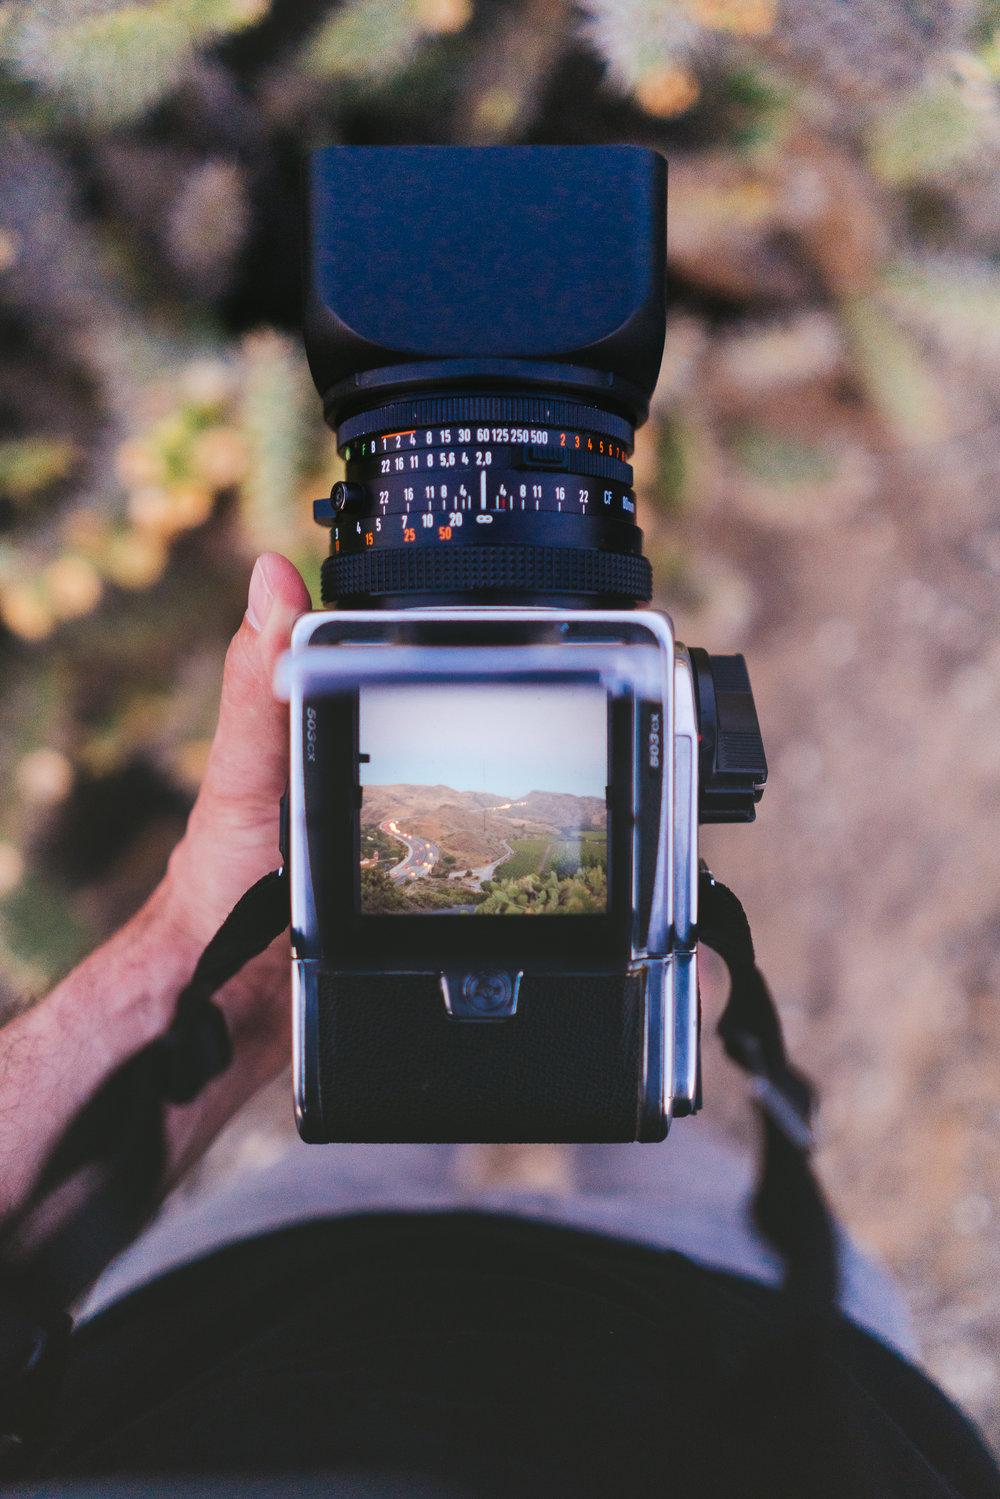 Film Photography - Analog for life